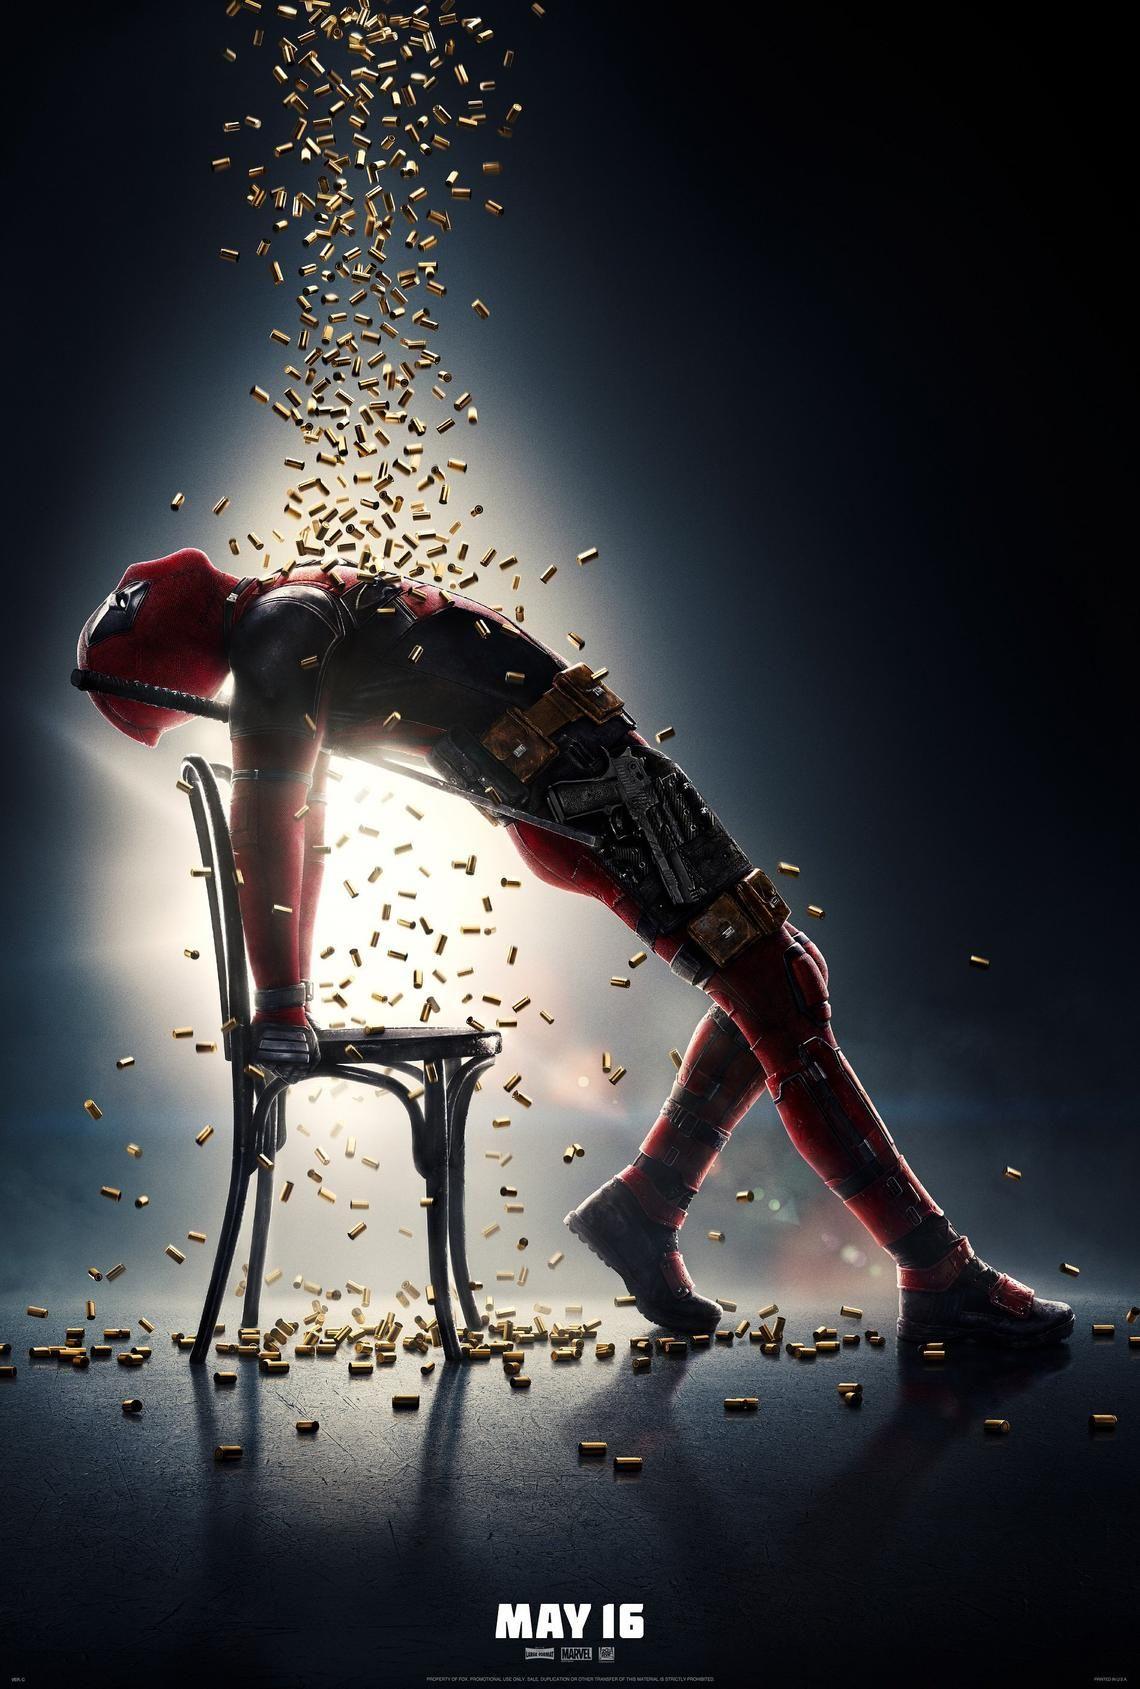 Deadpool 2 Poster in 2020 Deadpool, Funny wallpapers